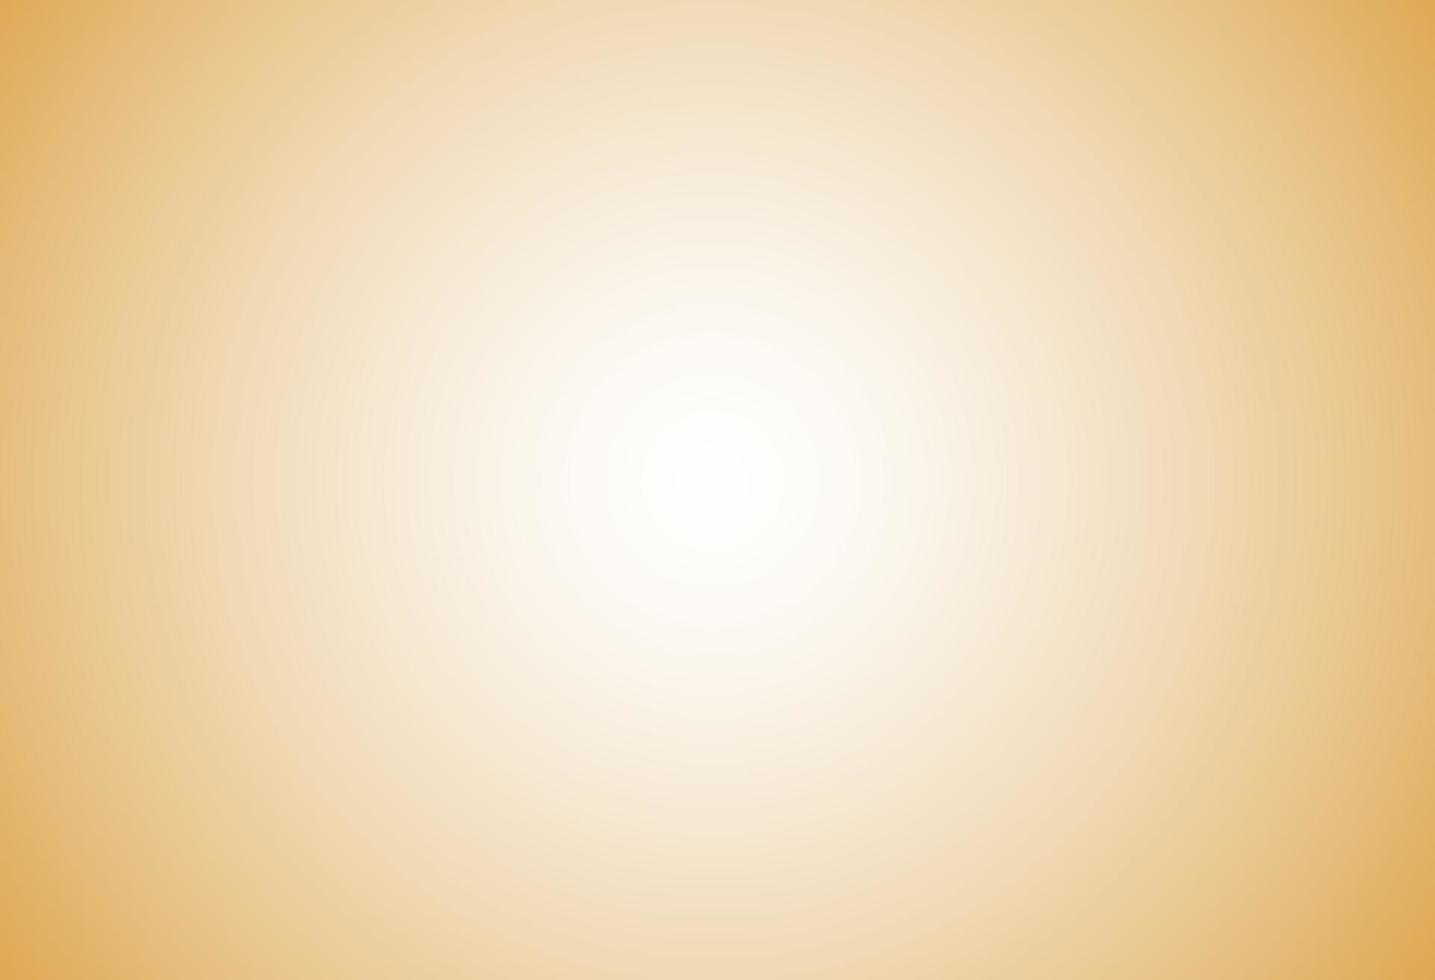 vektor guld suddig lutning stil. abstrakt lyxig bakgrundsillustration tapet